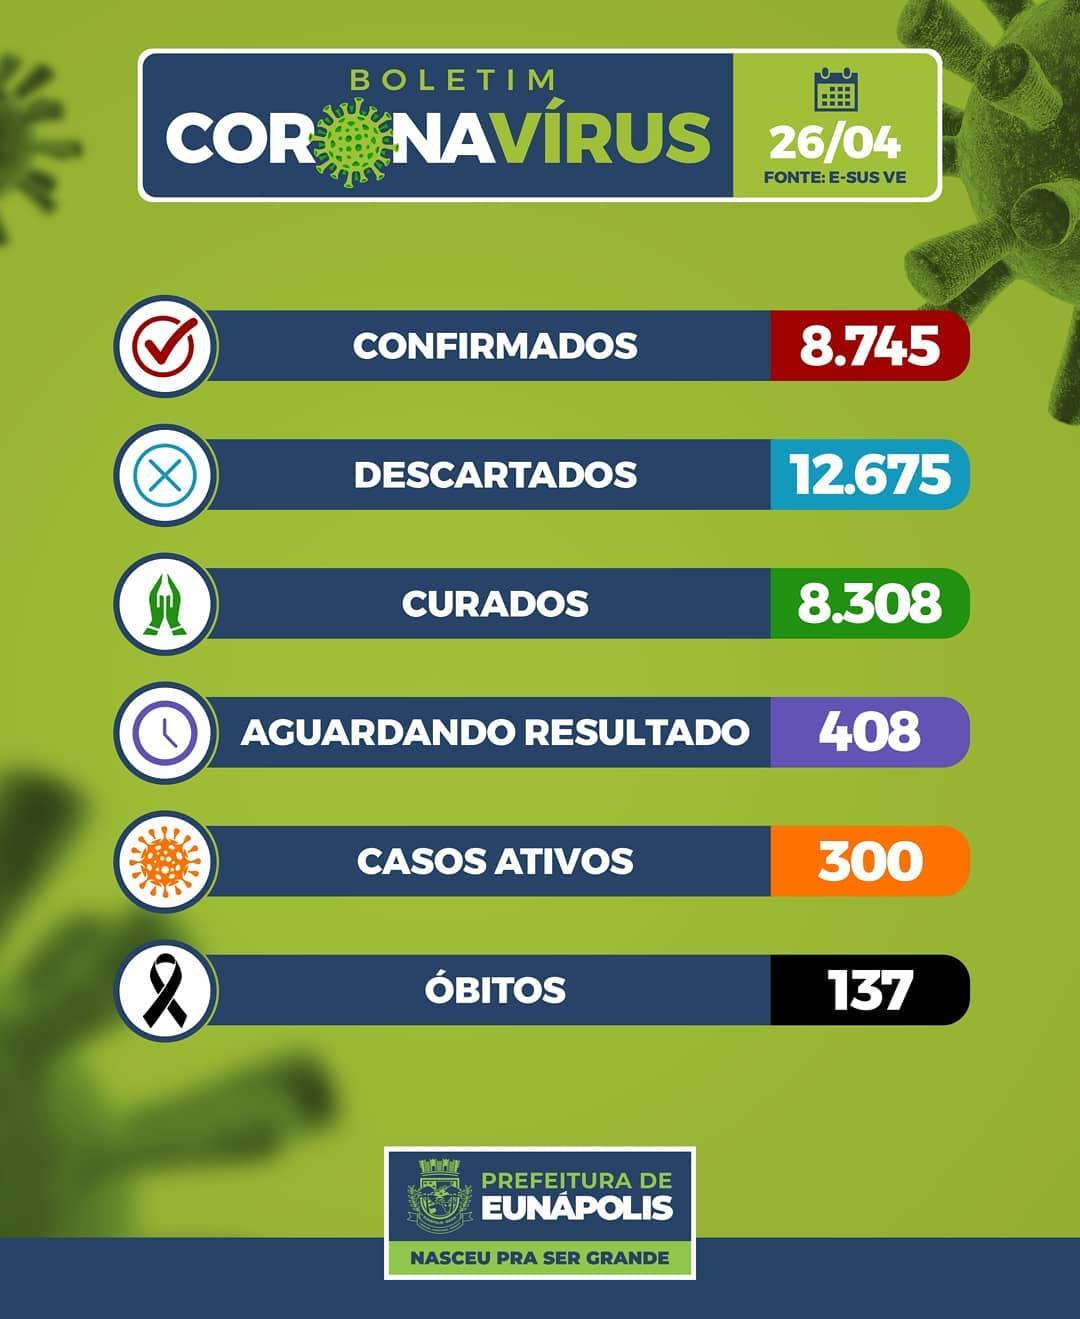 Boletim Epidemiológico Coronavírus do Município de Eunápolis para a data de hoje, 26/04/2021. 18